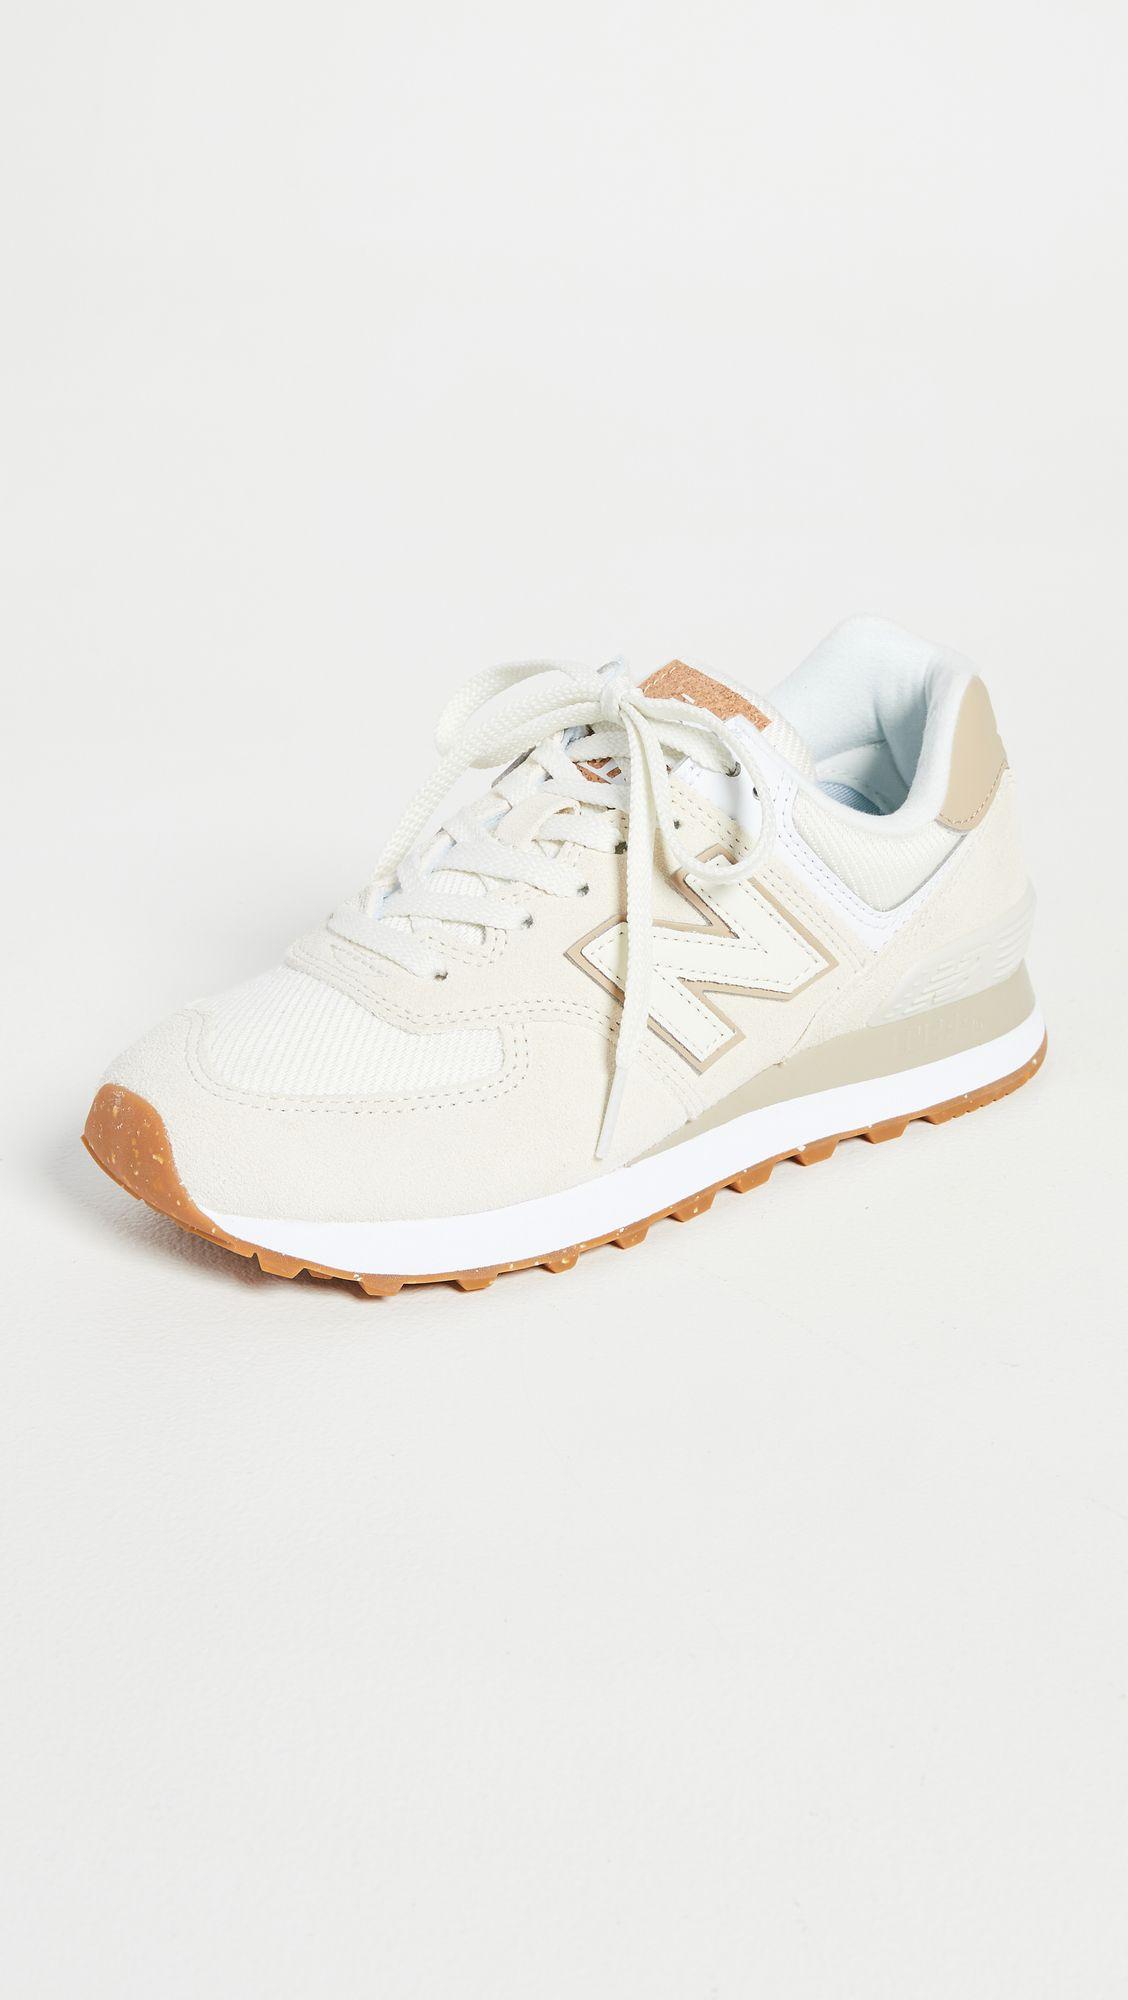 best new fashion items 286246 1629361289254